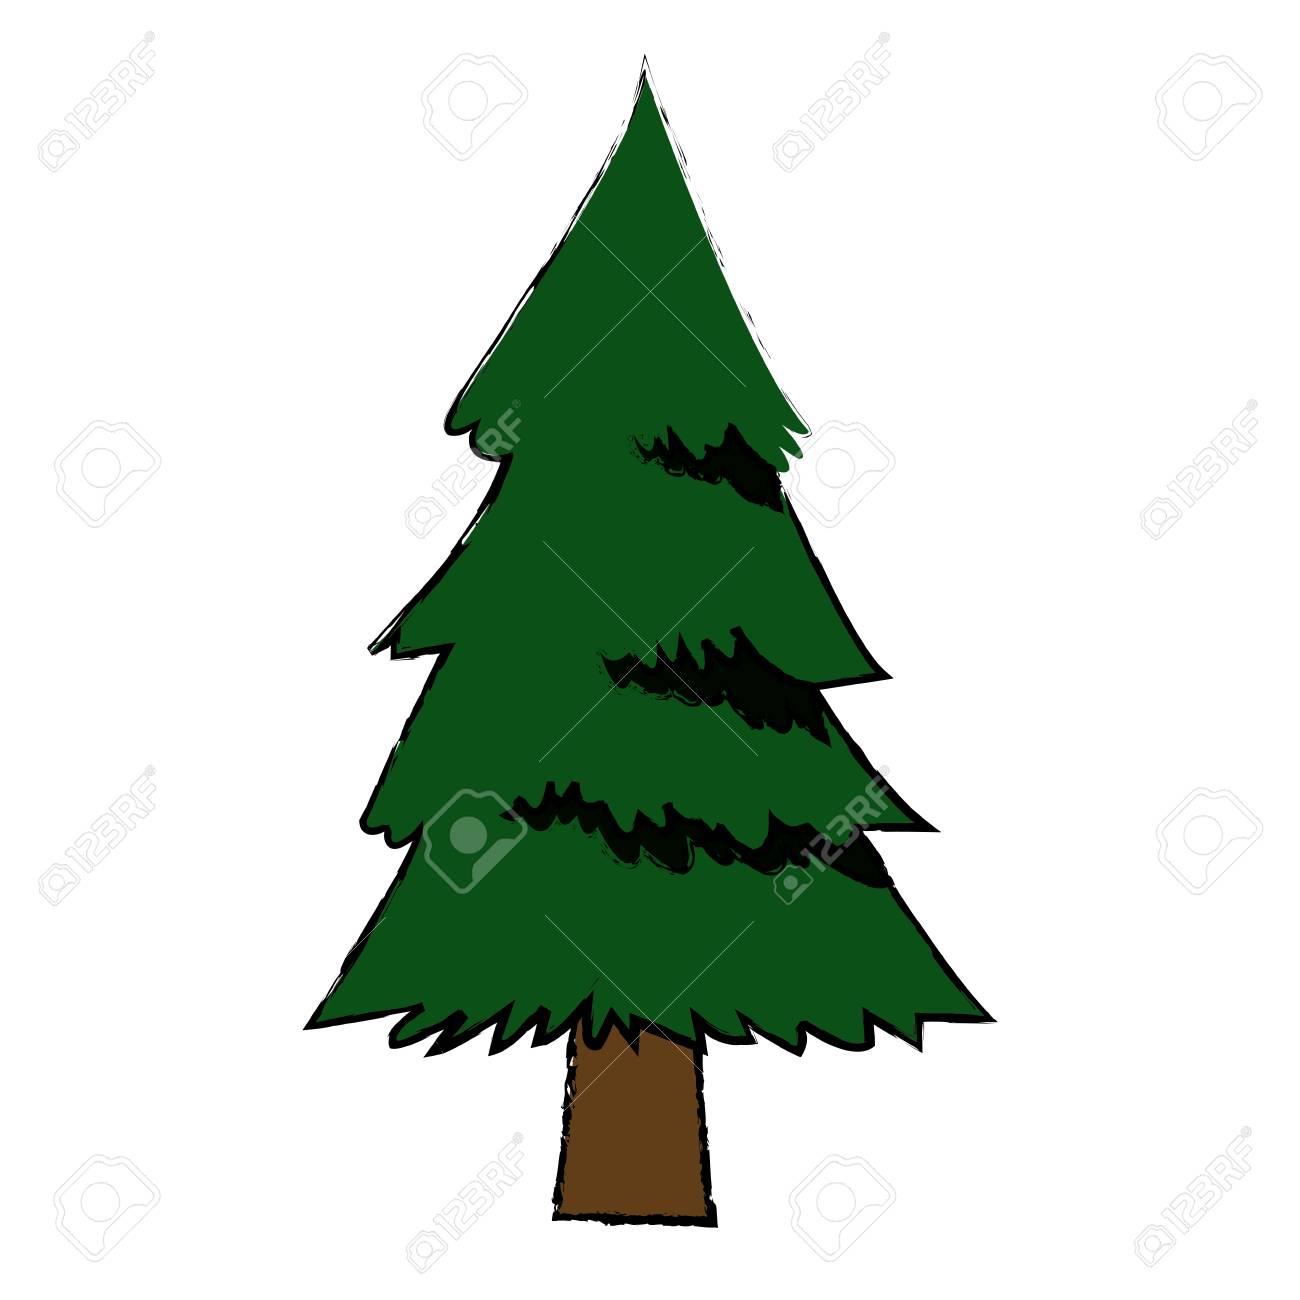 pine tree foliage trunk forest vegetation icon vector illustration rh 123rf com vector pine trees silhouettes free vector pine tree shape